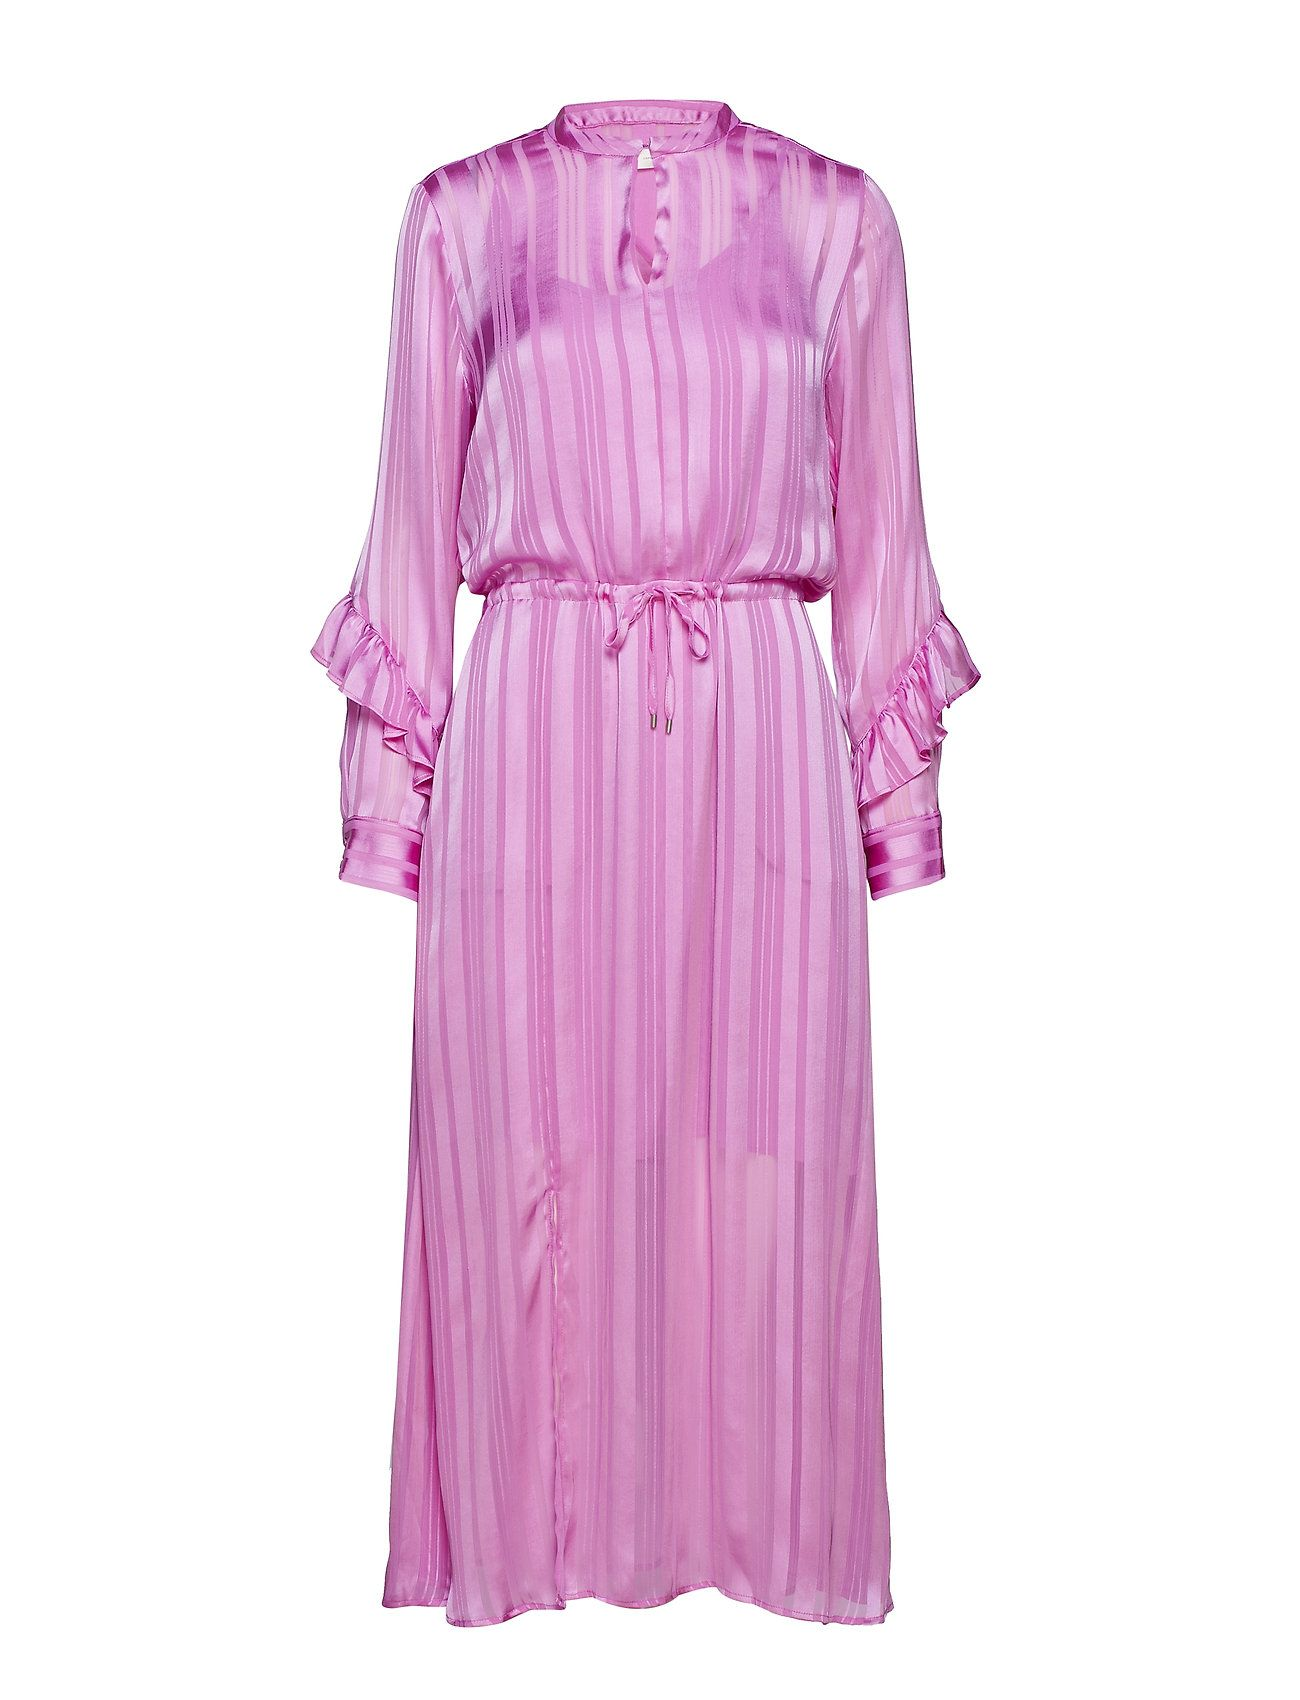 9134e675 Hilma Dress i 2019 | DRESSES // WOMEN'S CLOTHING | Dahlia, Stof og Pink